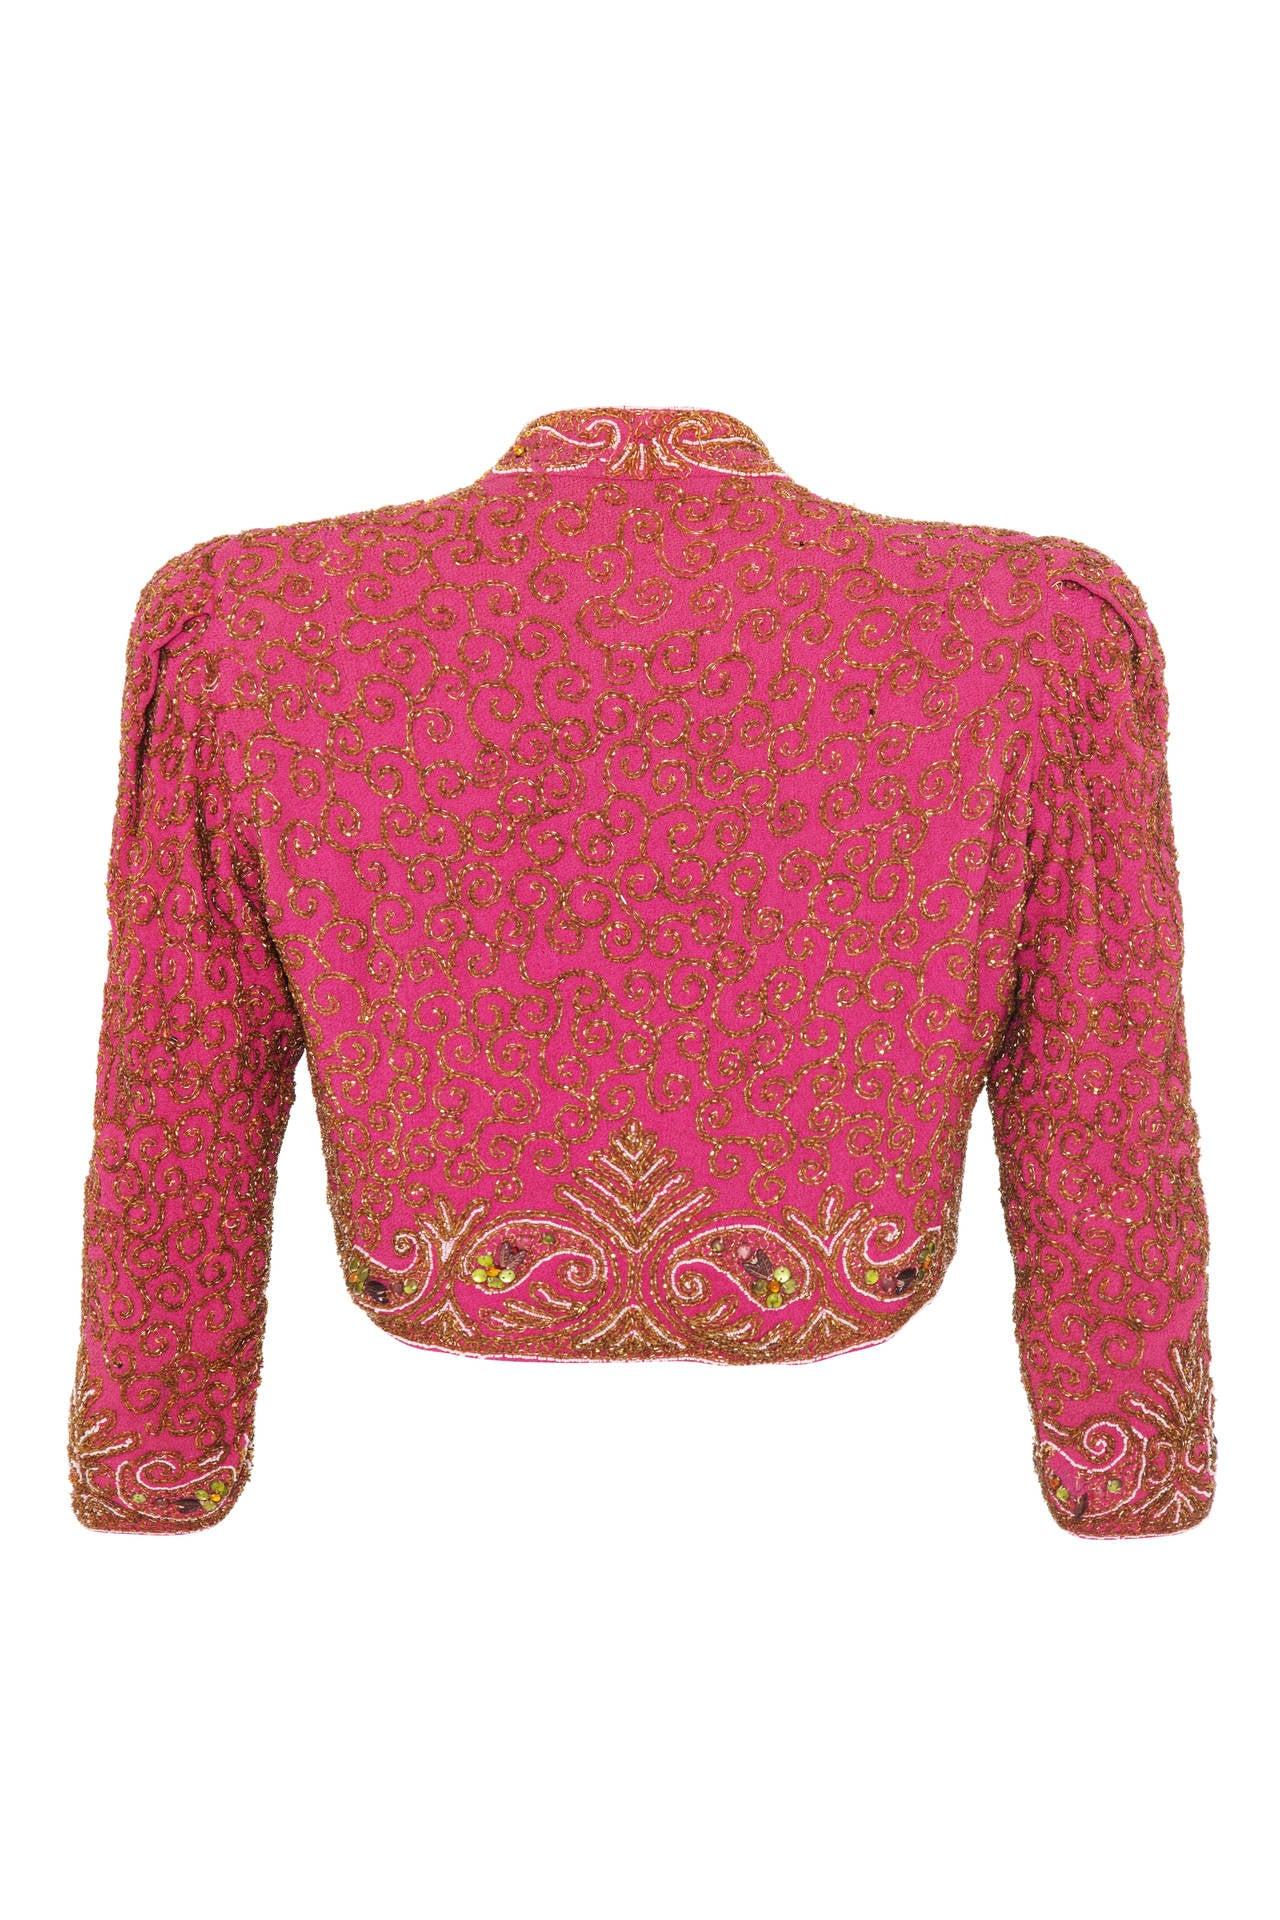 Spectacular 1930s Pink Silk Beaded Bolero Jacket 2